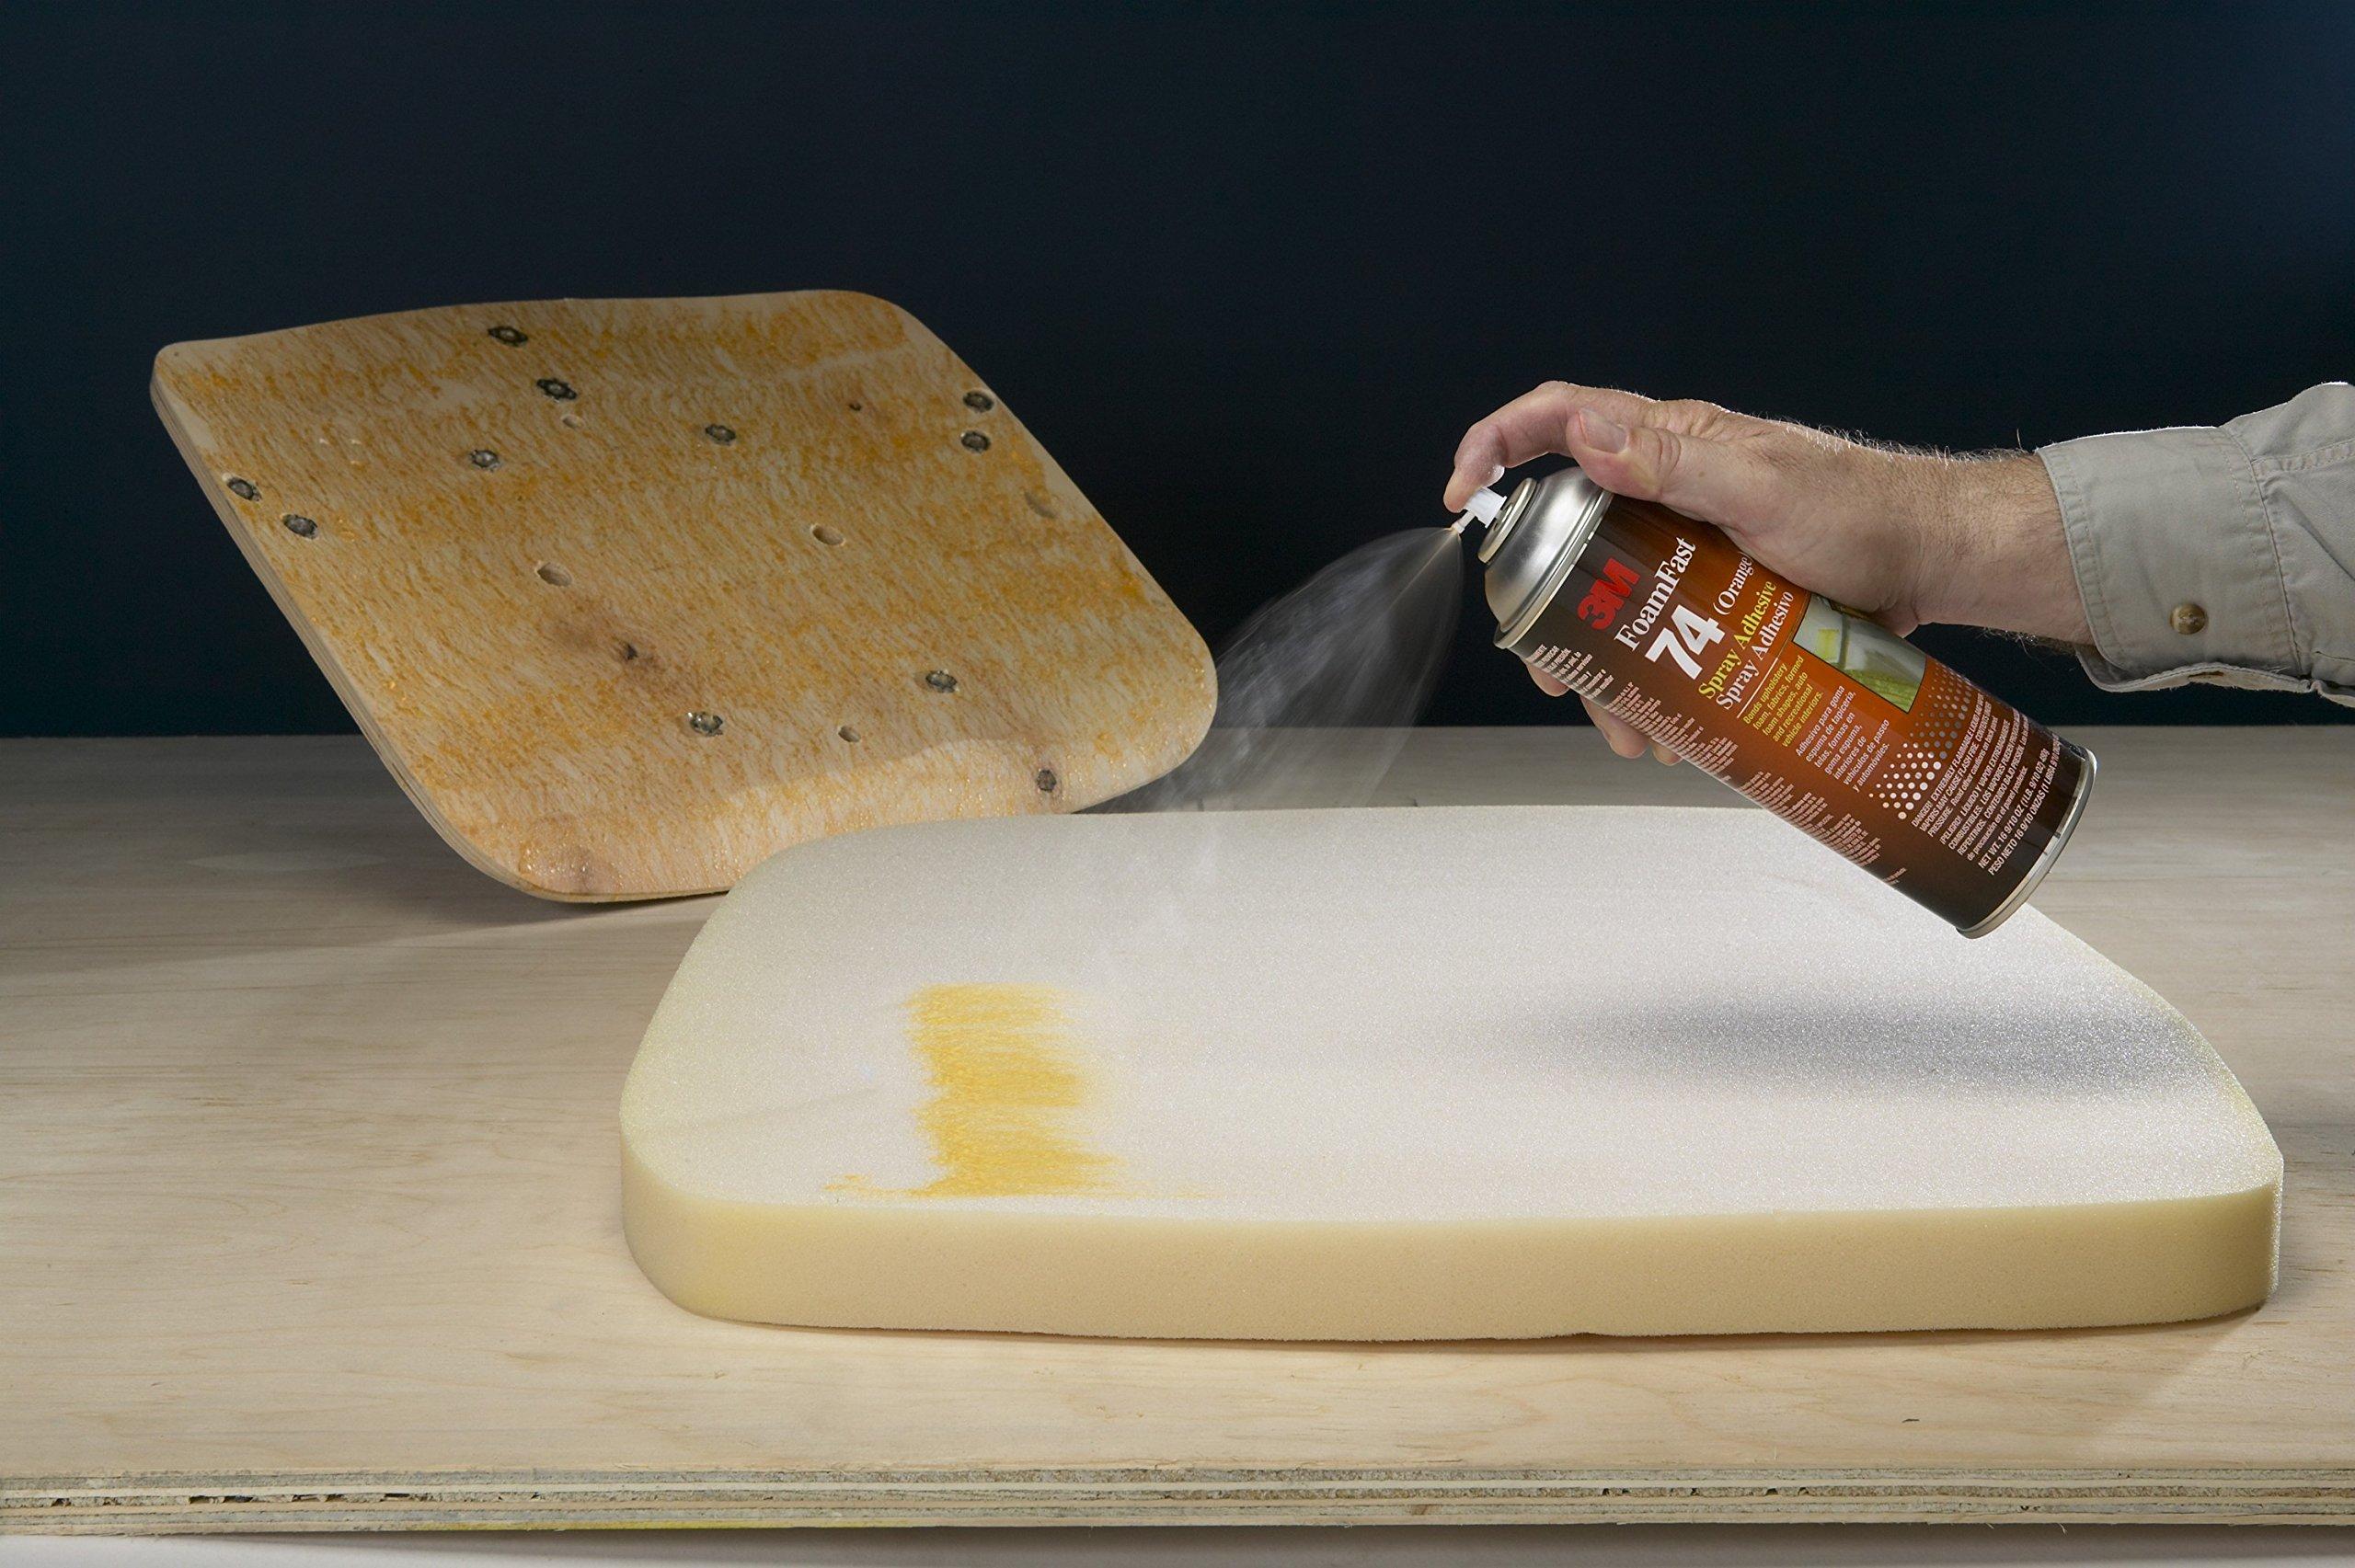 3M Foam Fast 74 Spray Adhesive - Low VOC <25% Orange, 24 fl oz can, Net Weight 19.0 oz (Pack of 1)